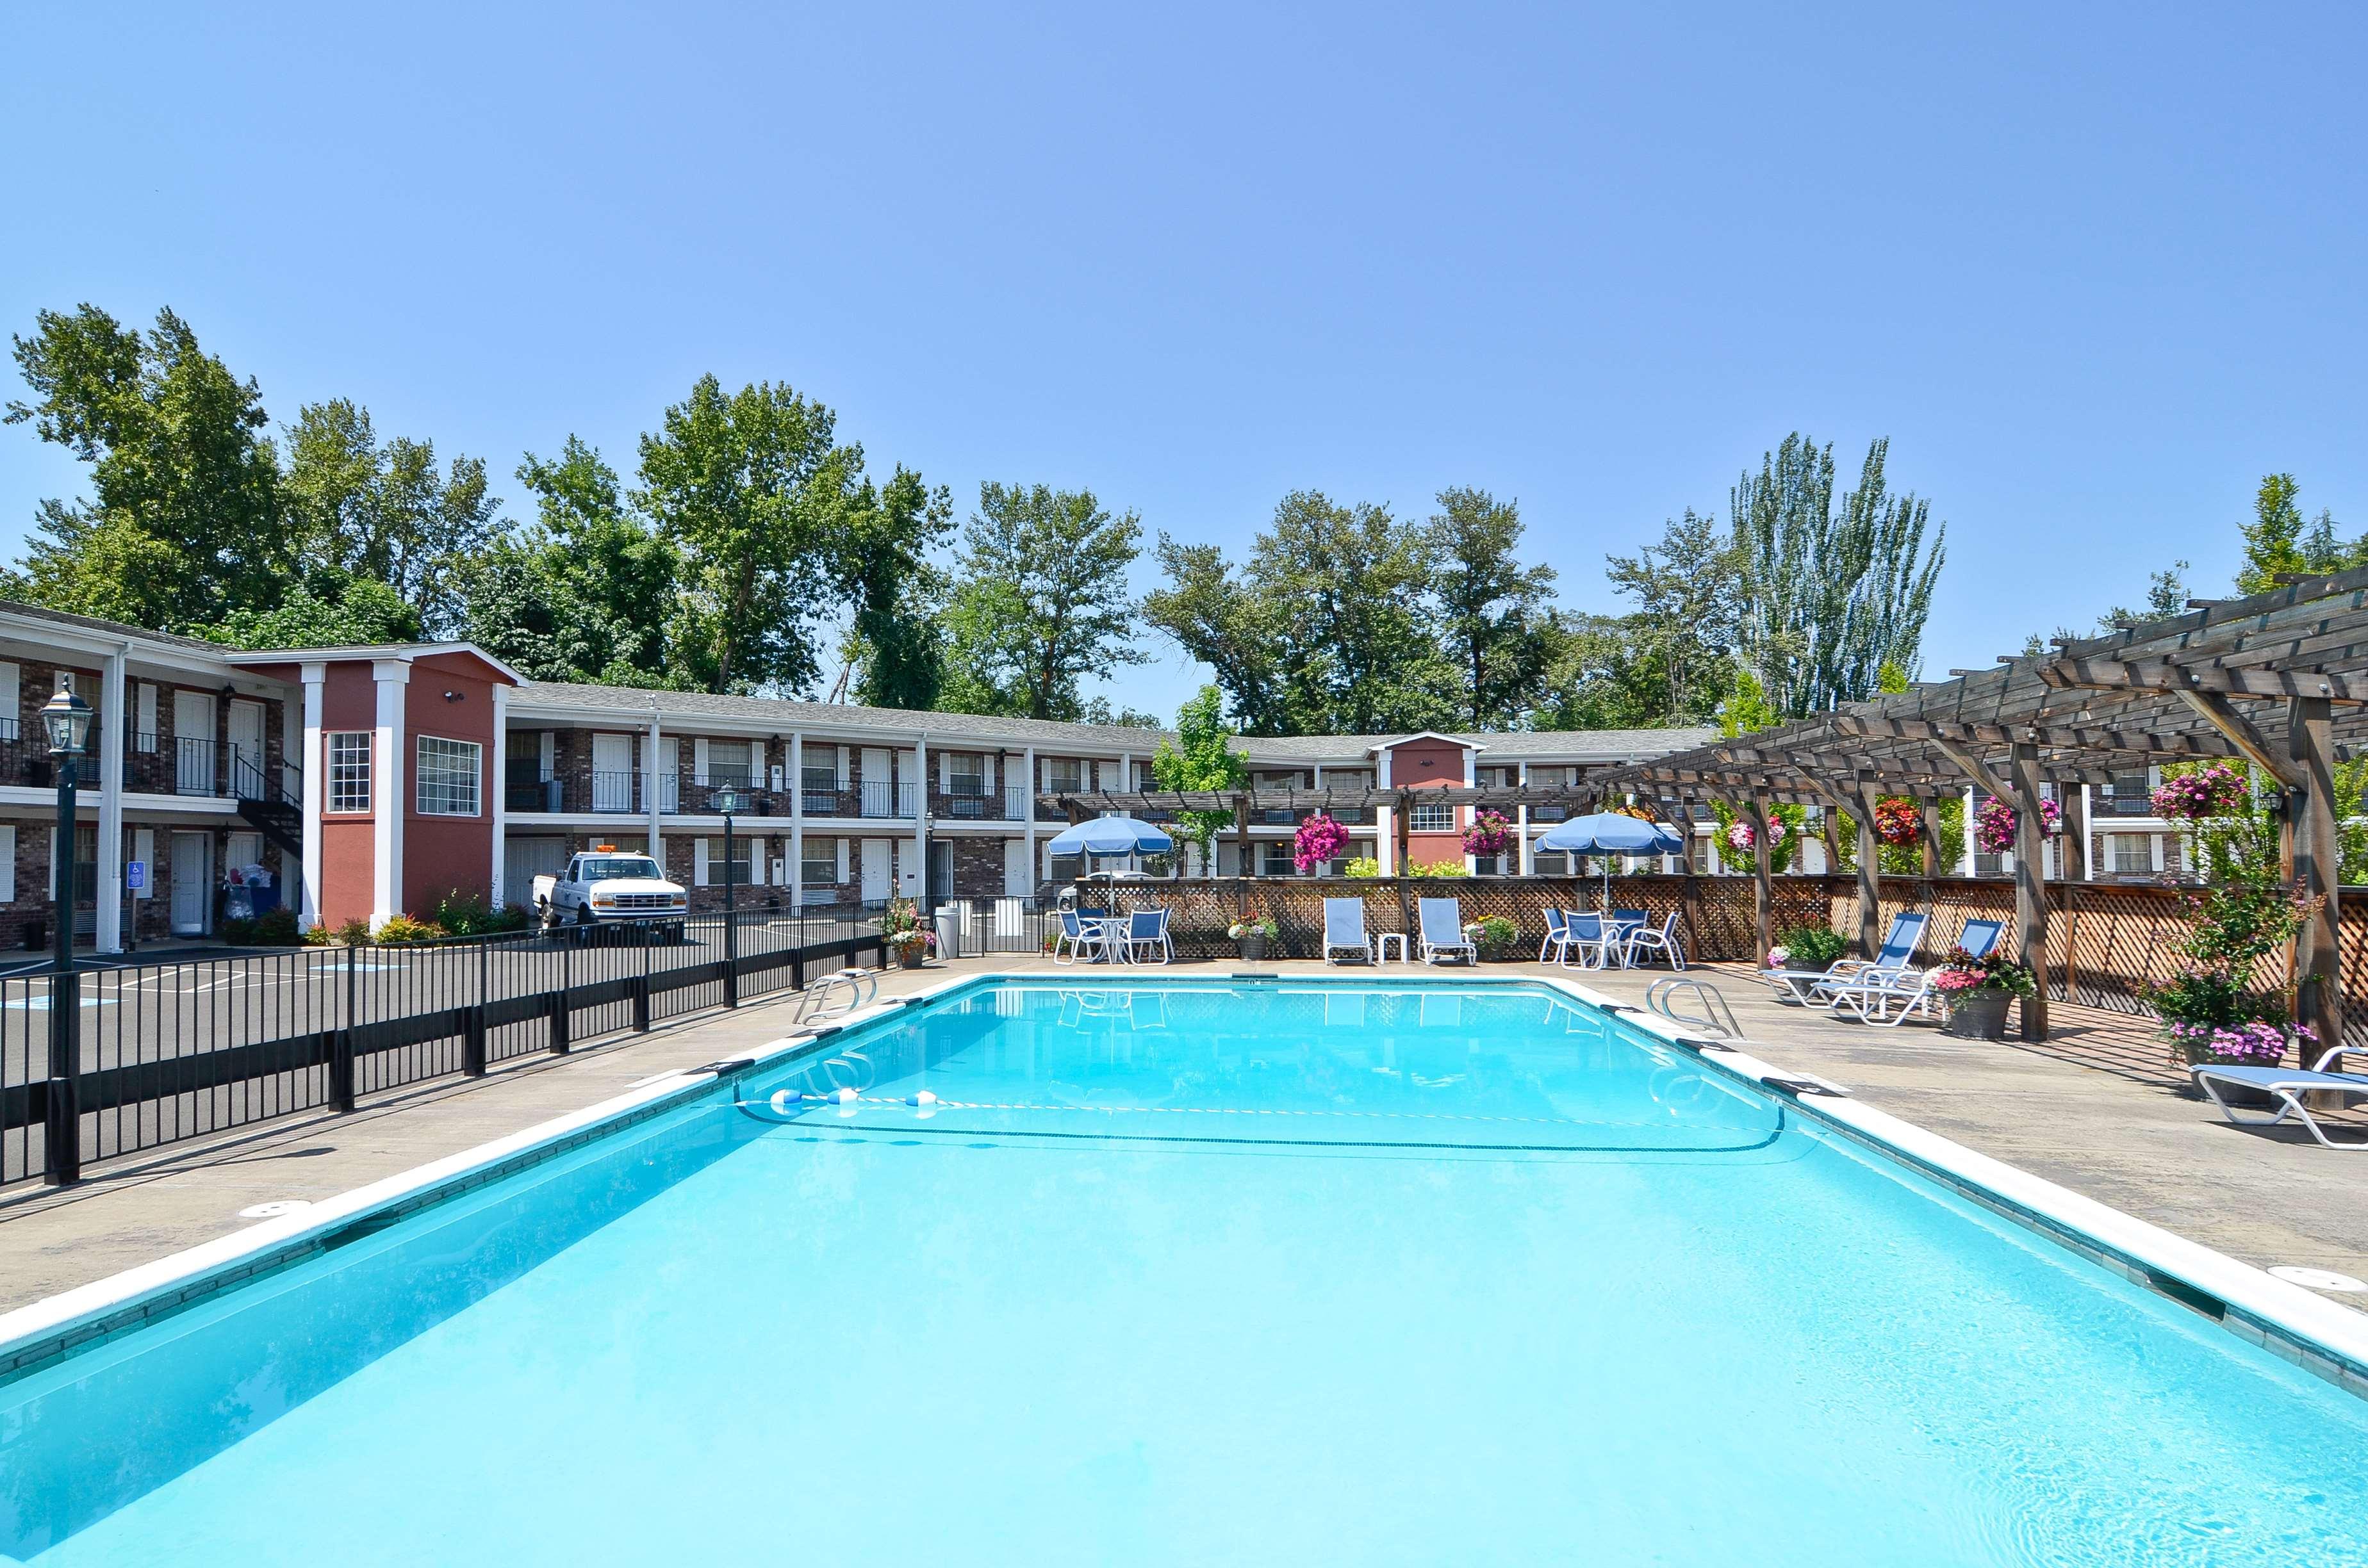 Best Western Horizon Inn image 49